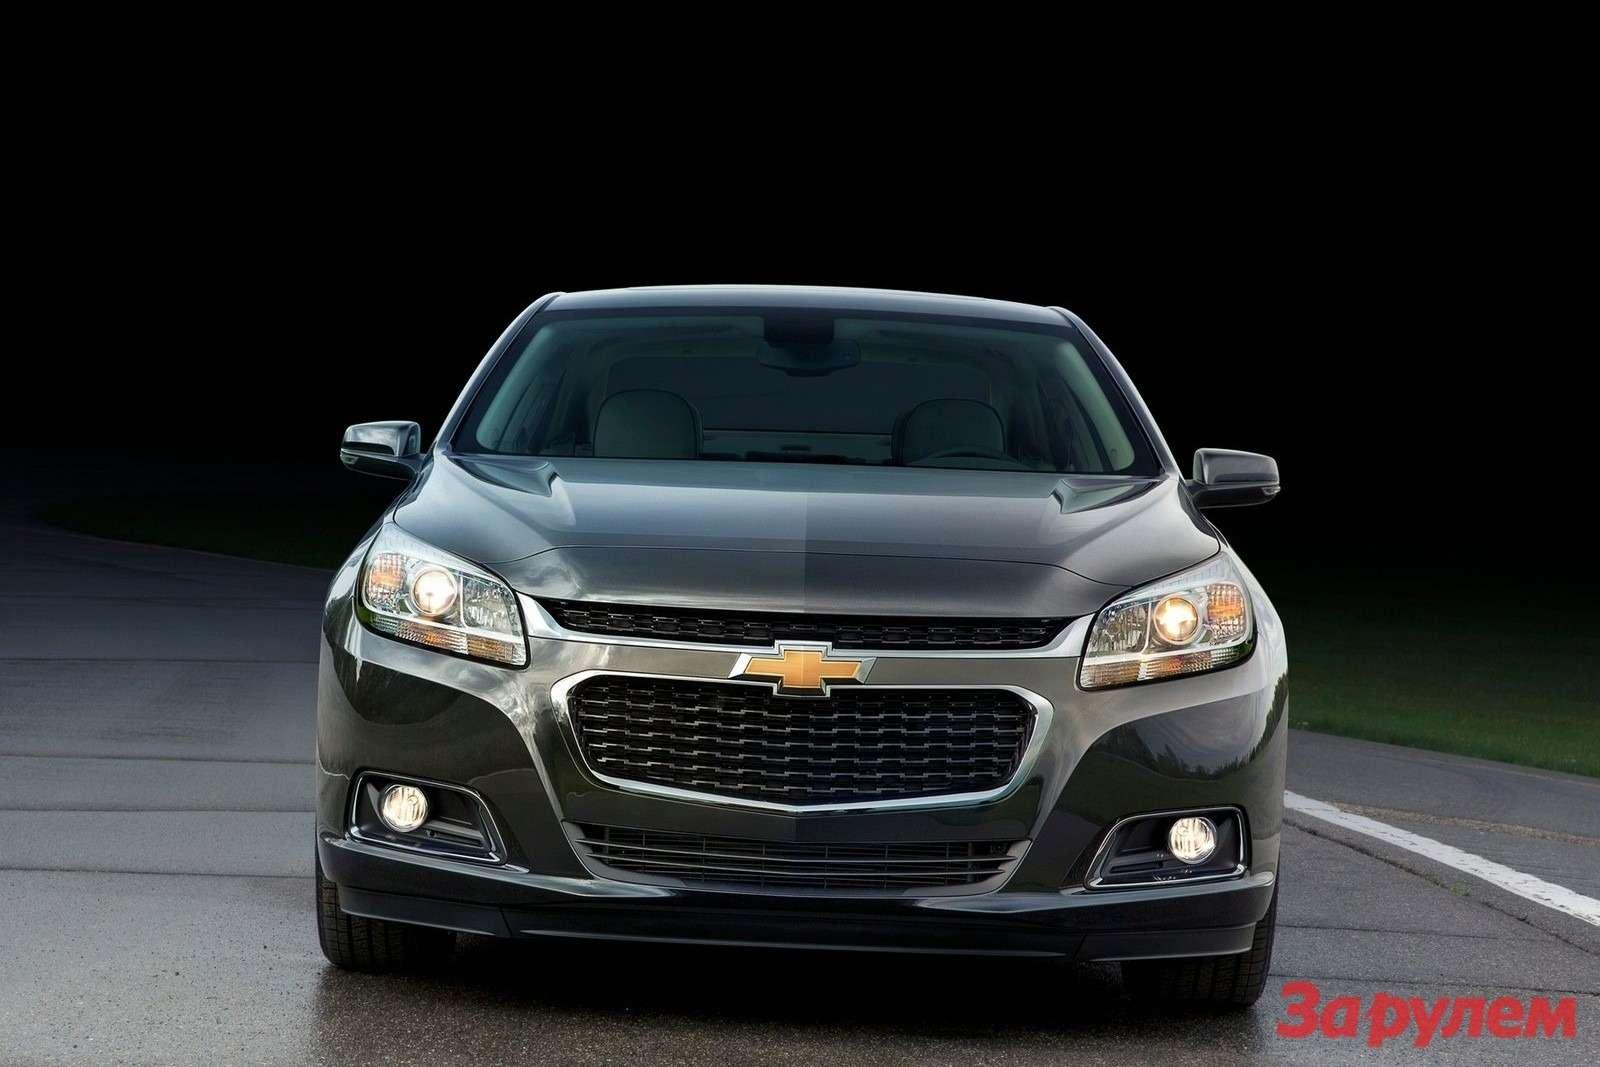 Chevrolet Malibu 2014 1600x1200 wallpaper 02